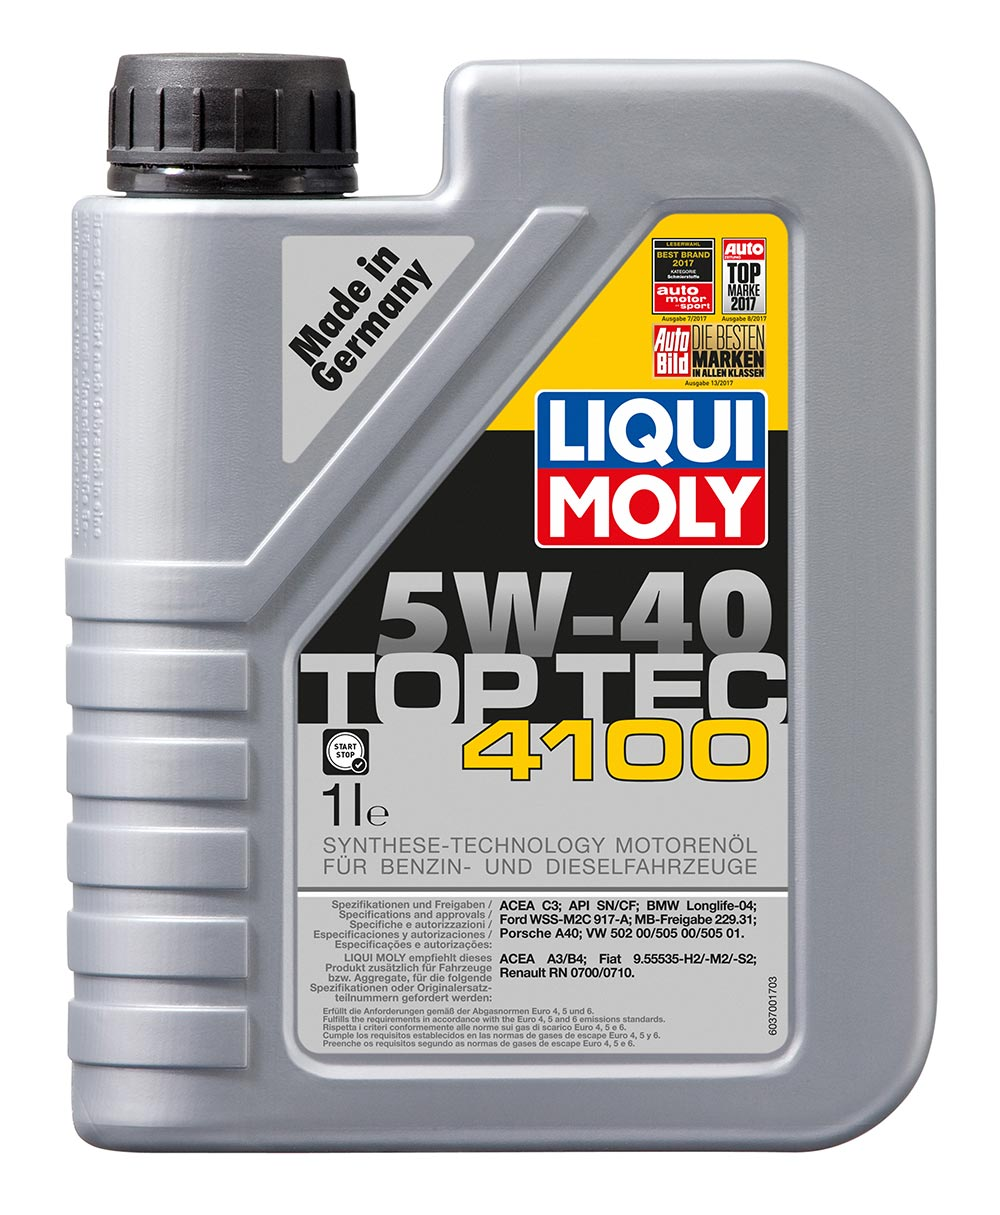 Масло моторное синт. 5W40 Top Tec 4100 1л API SM/CF.ACEA A3-04/B4-04/C3-04:VW.MB